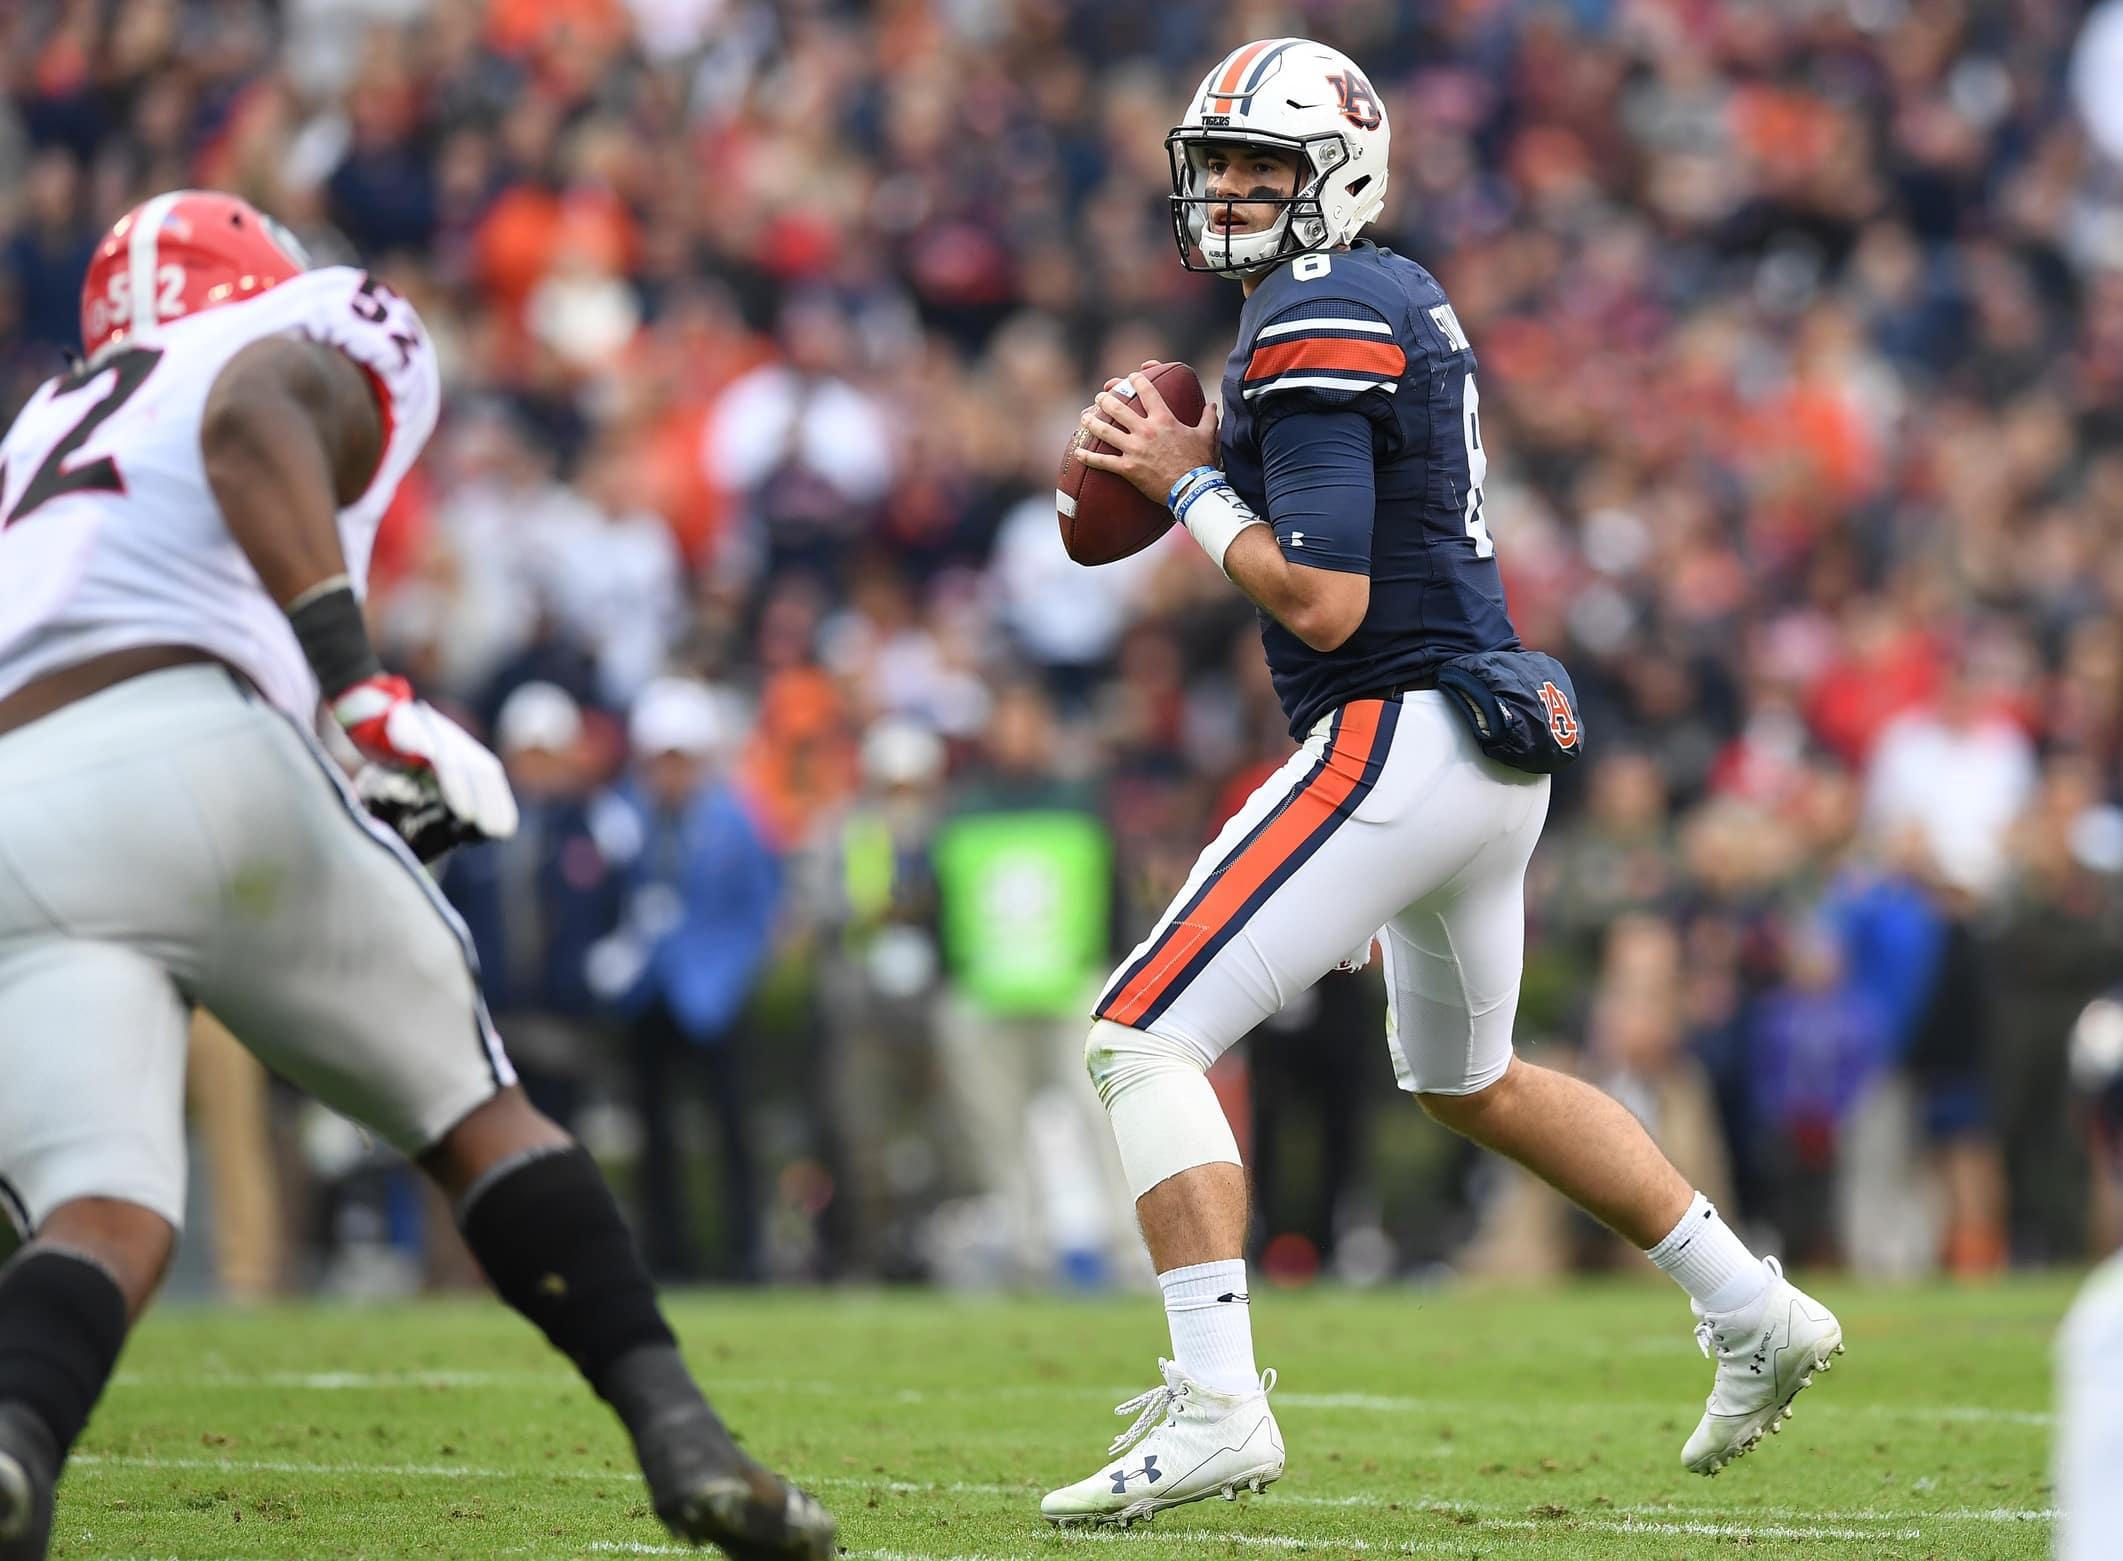 Auburn quarterback Jarrett Stidham is one of the most important players in championship weekend